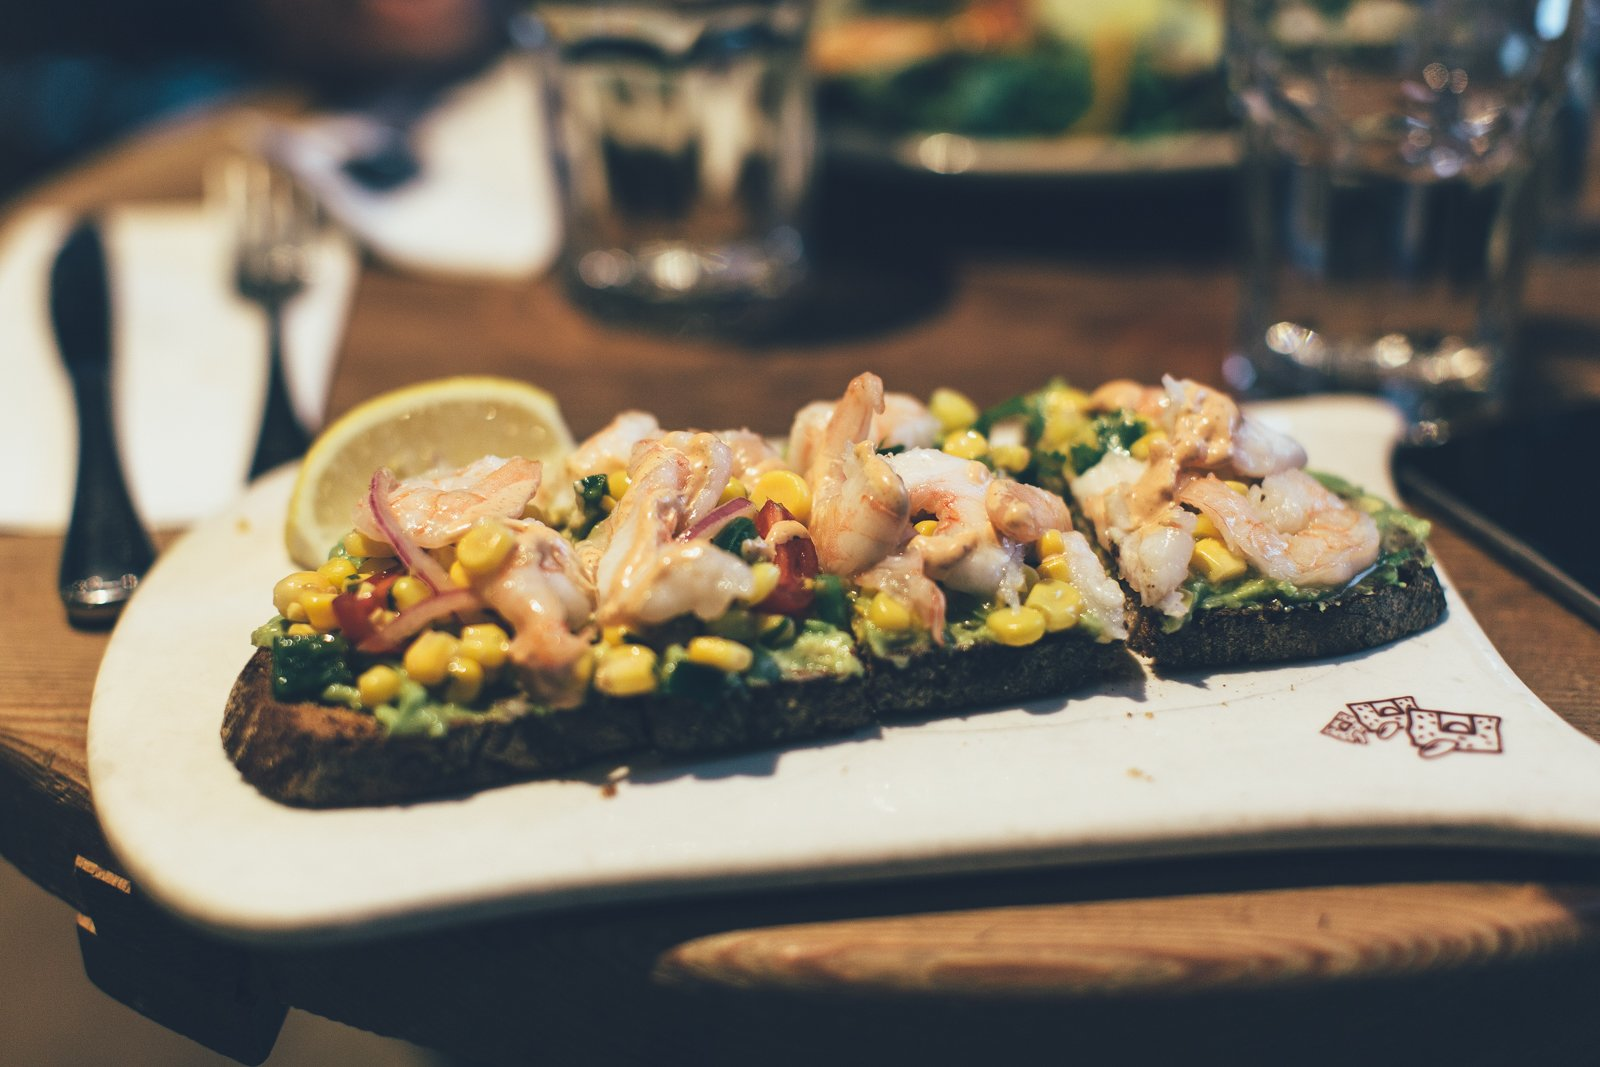 Flo's favorite Lunch Spots in NYC